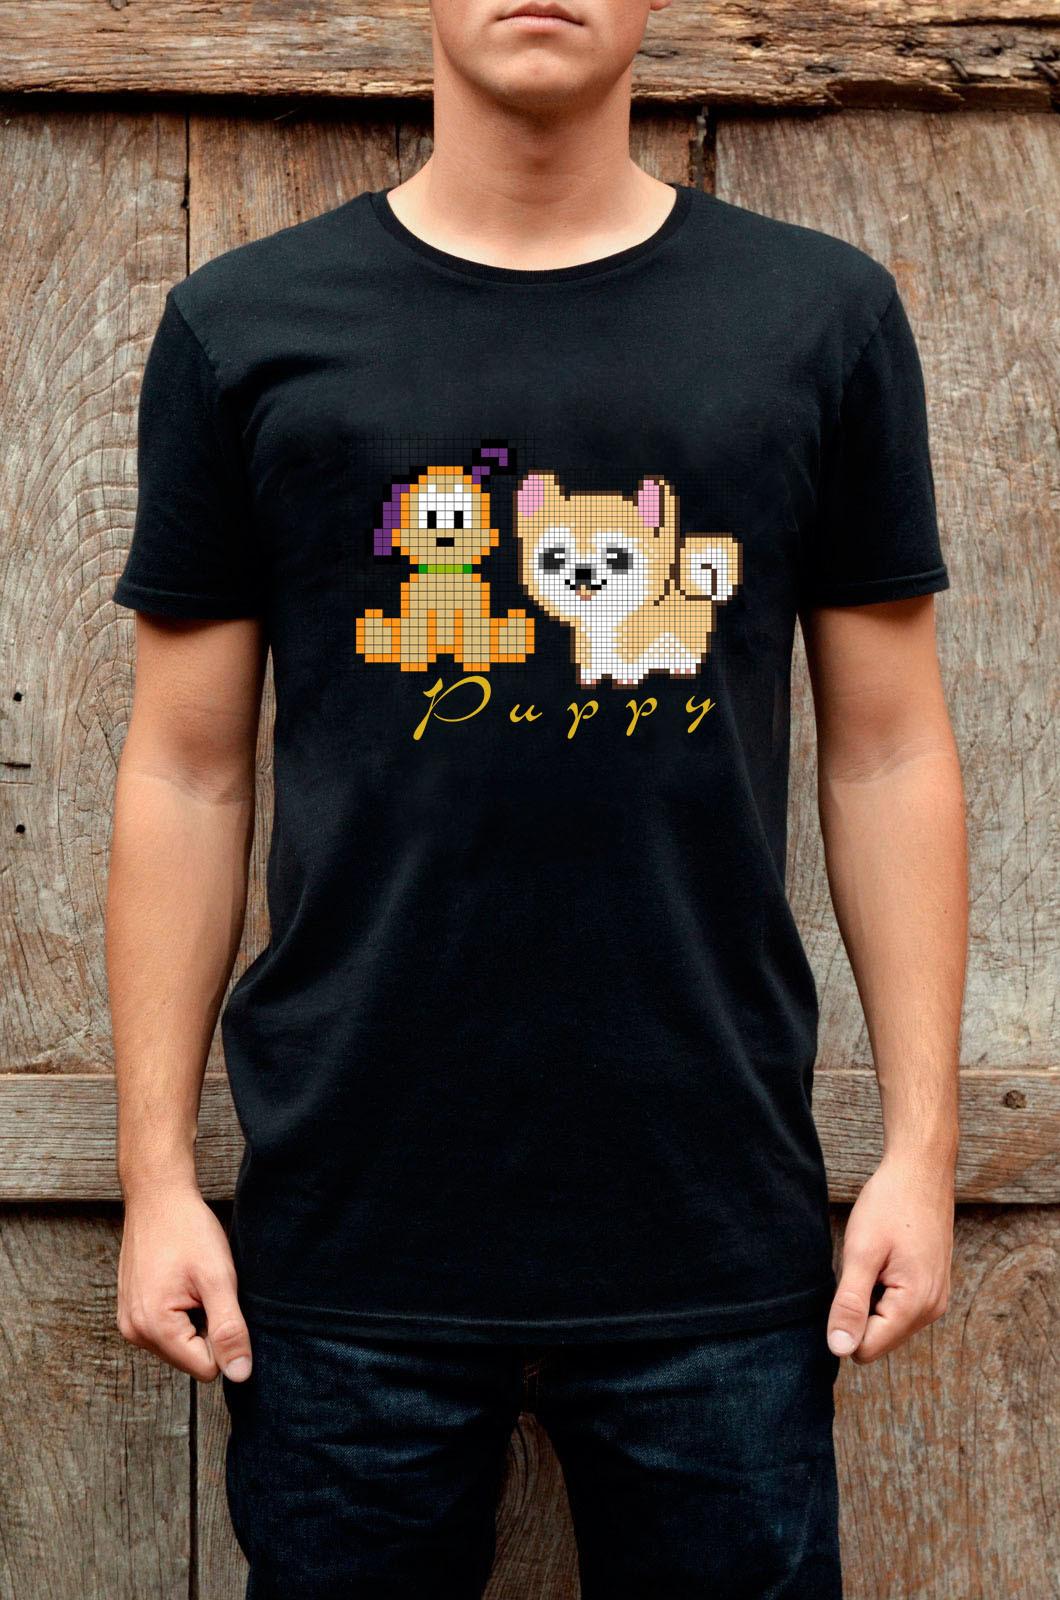 Puppy dog wants kitty cute puppy dog